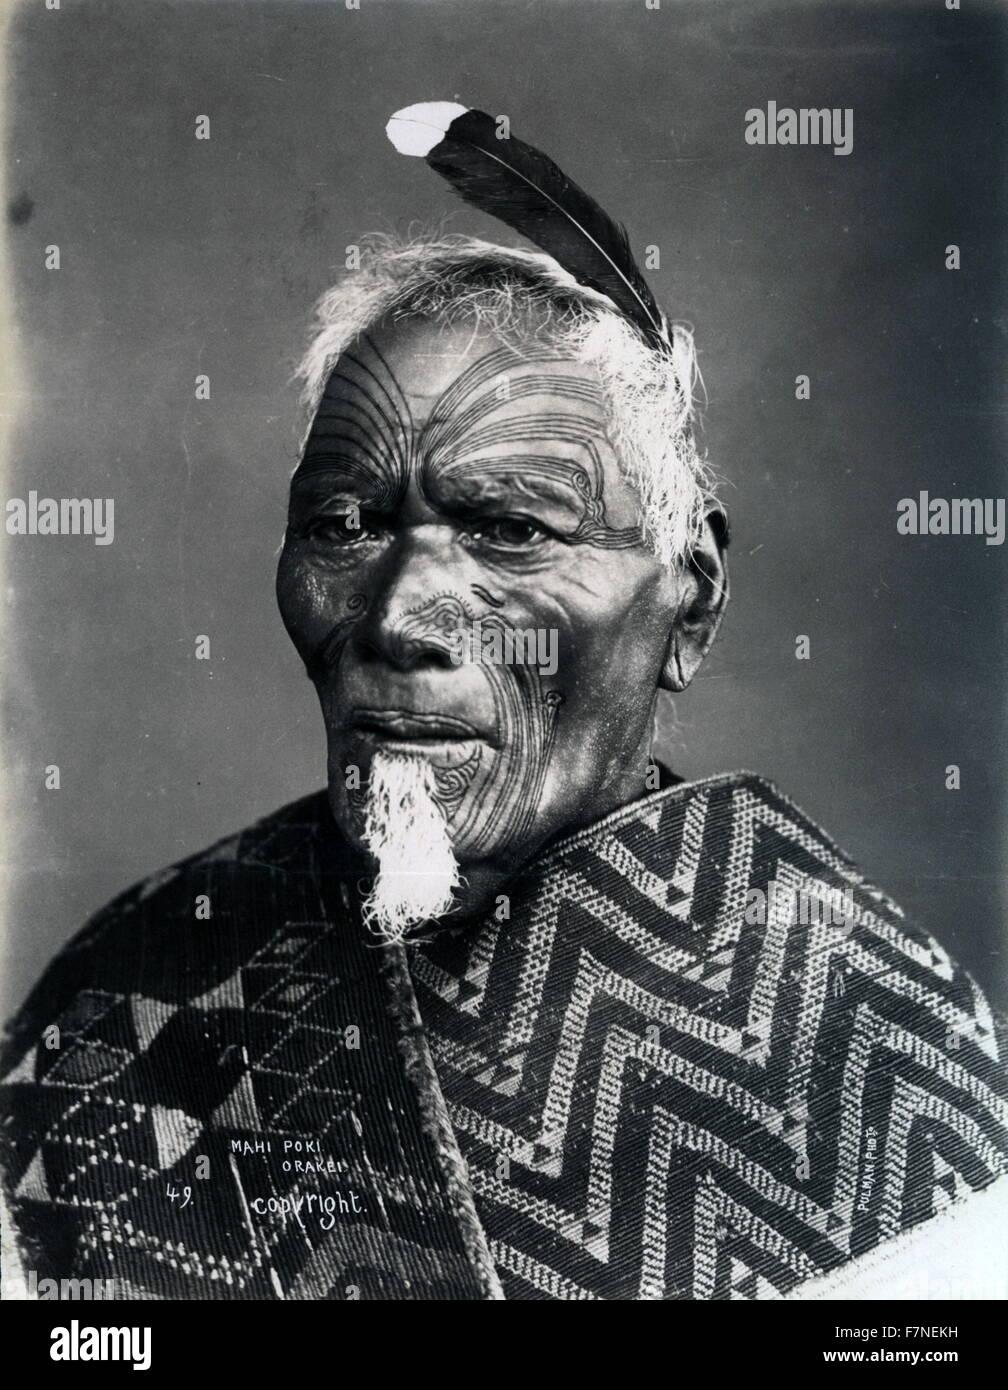 New Zealand, Maori chieftain Mahi Poki Orakei by Elizabeth Pulman 1869 - Stock Image